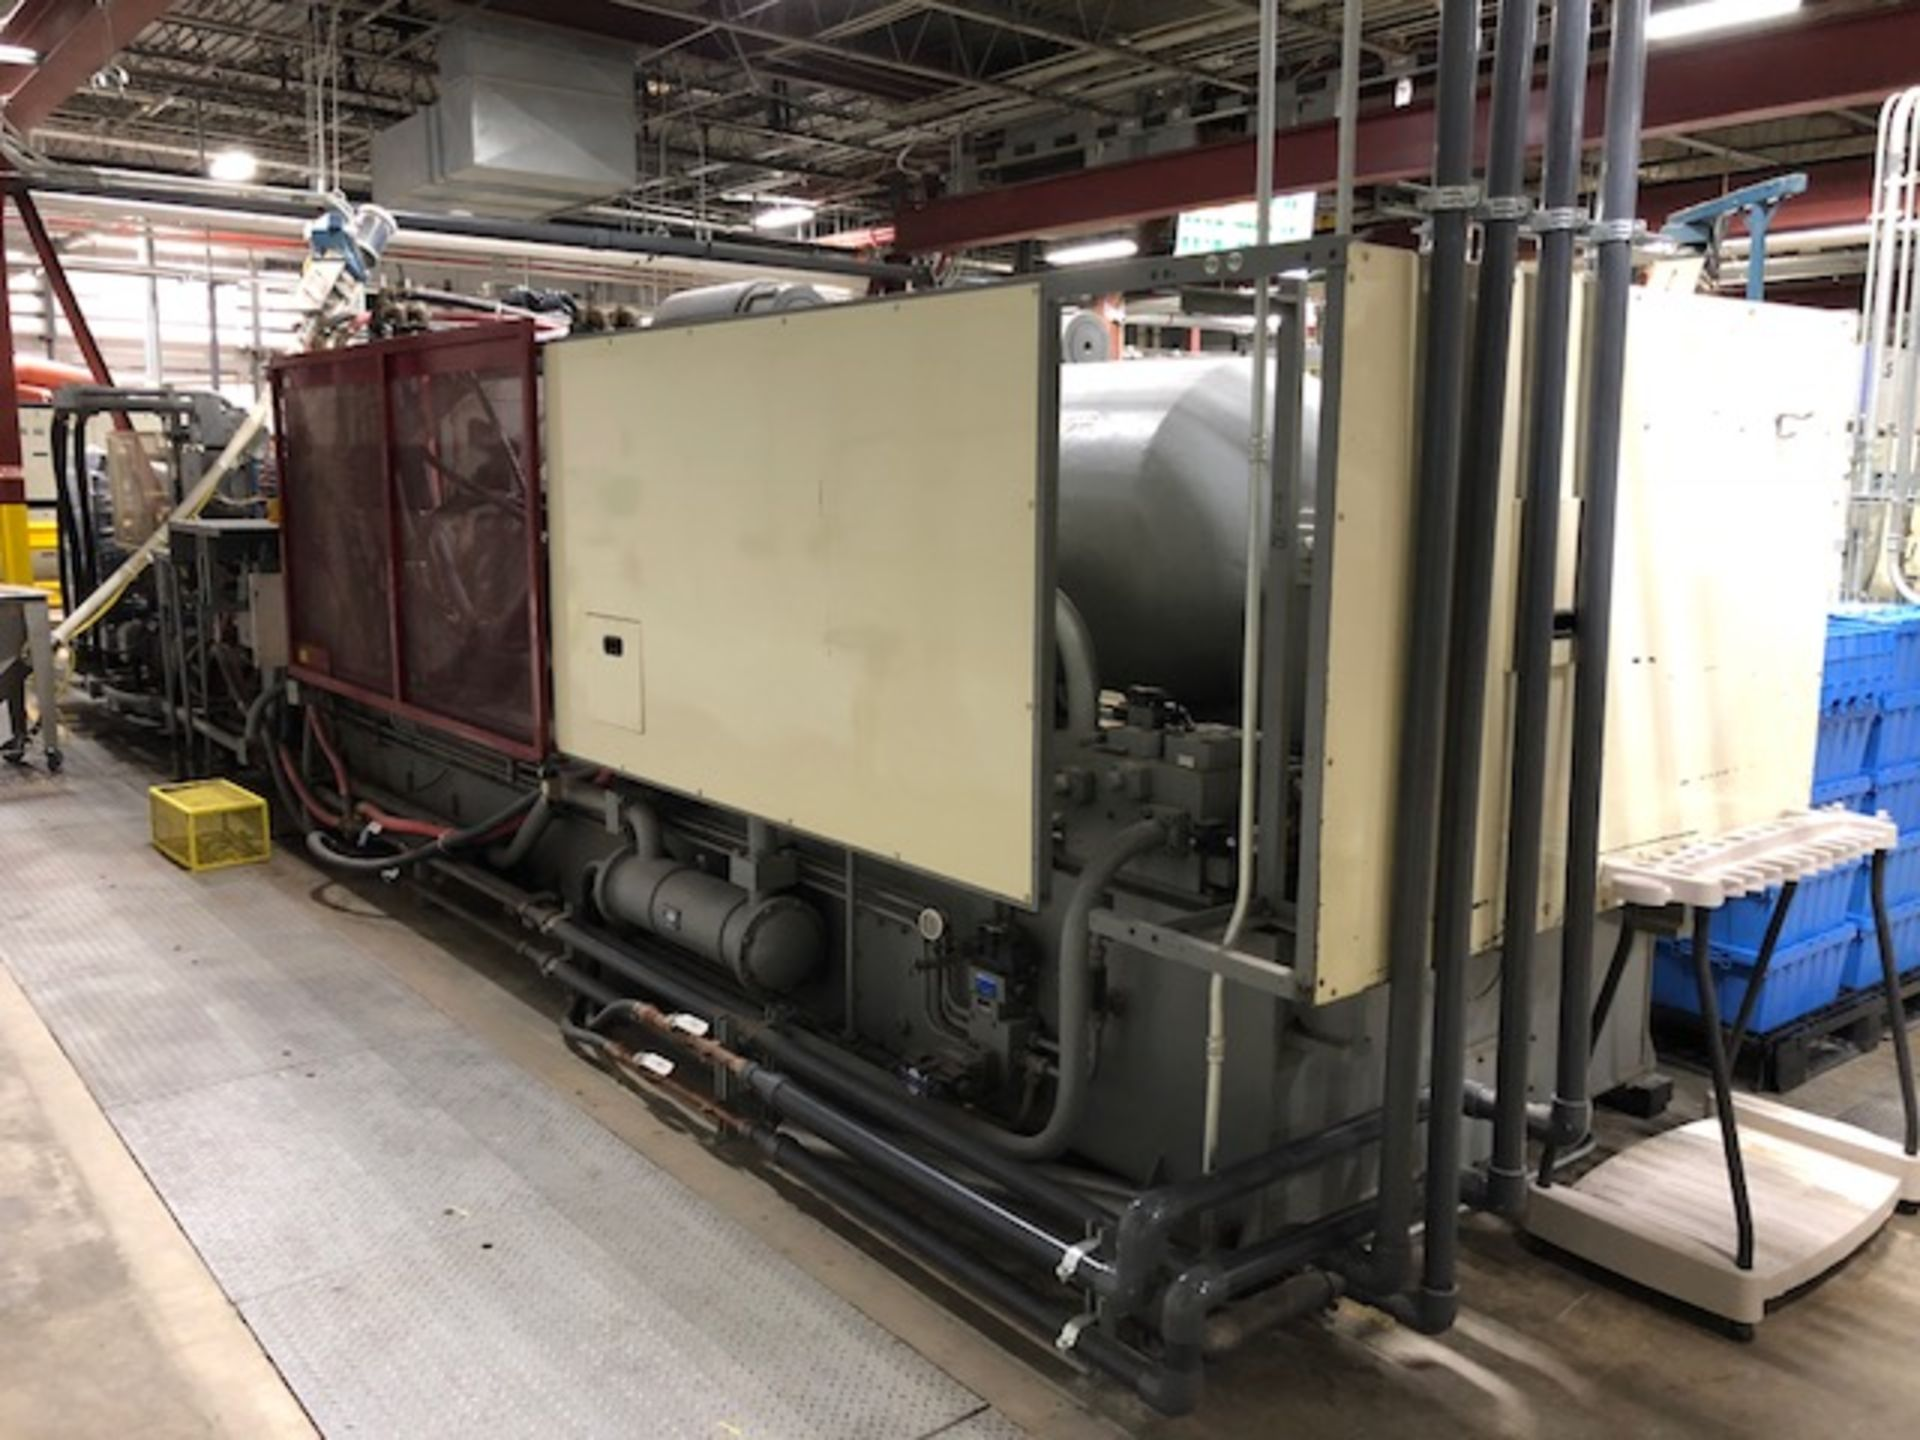 Lot 136B - 720 Ton, 194 oz. LG Injection Molding Machine (2003)